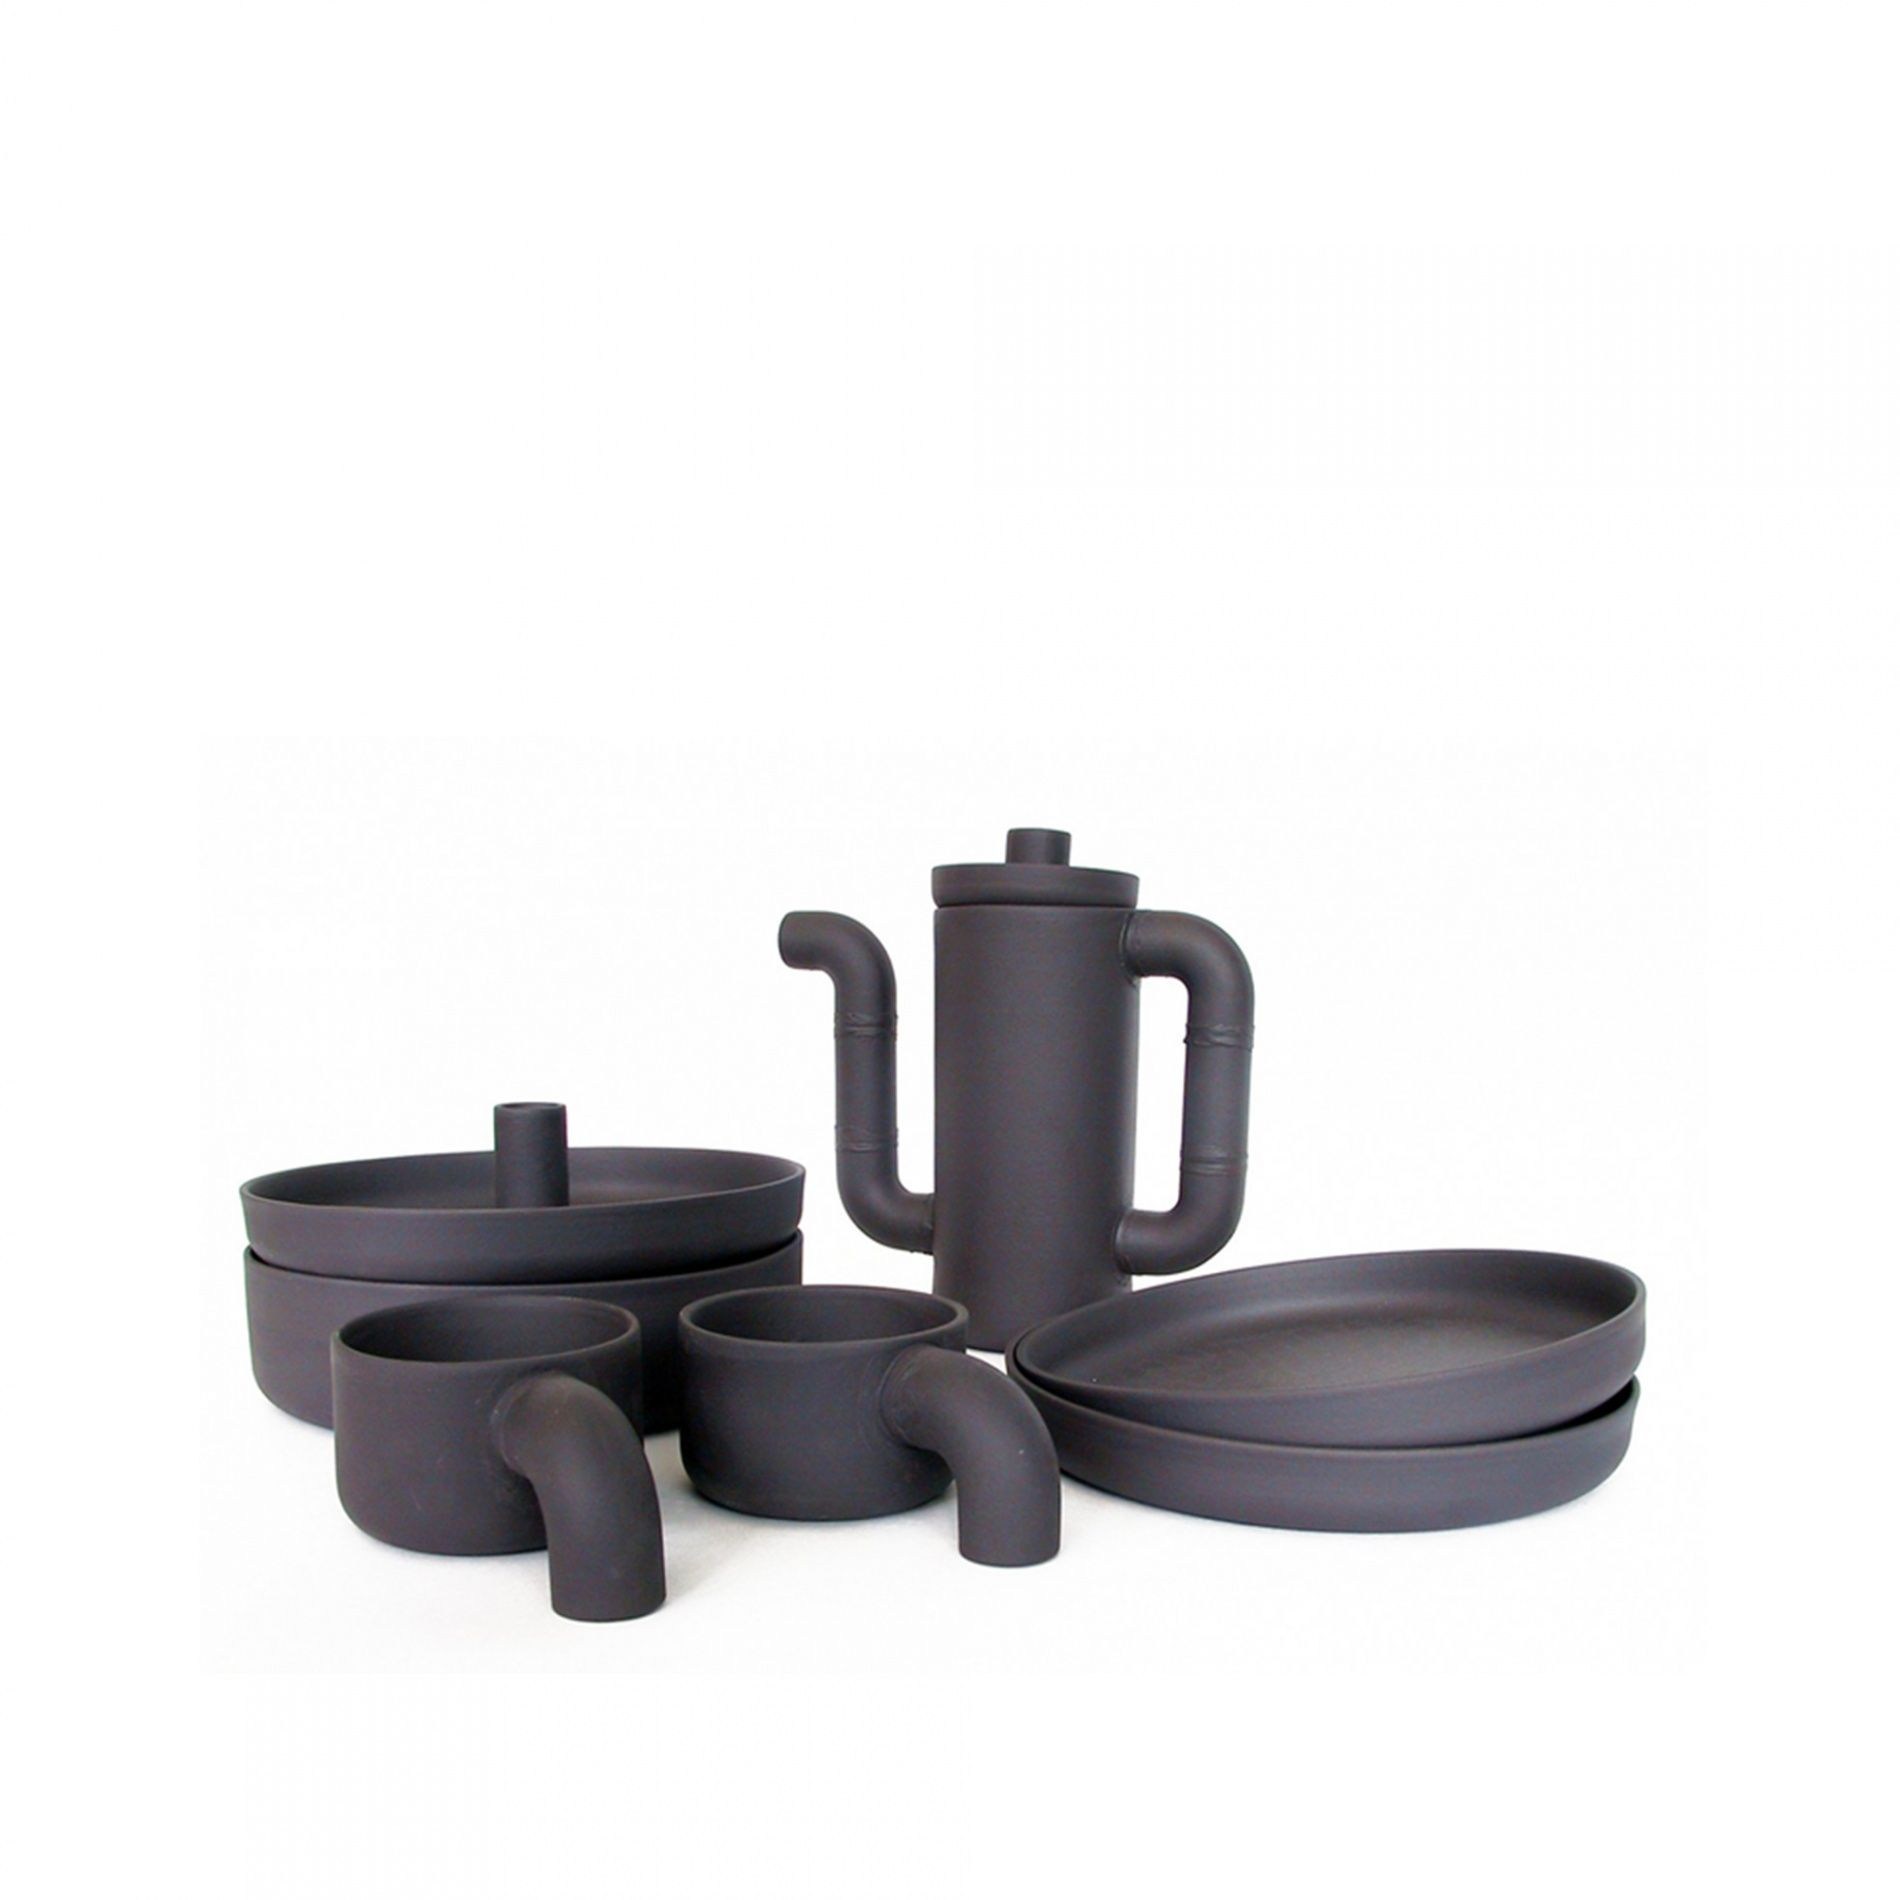 Designer Coffee Set | Dutch Black Porcelain | Ineke Hans